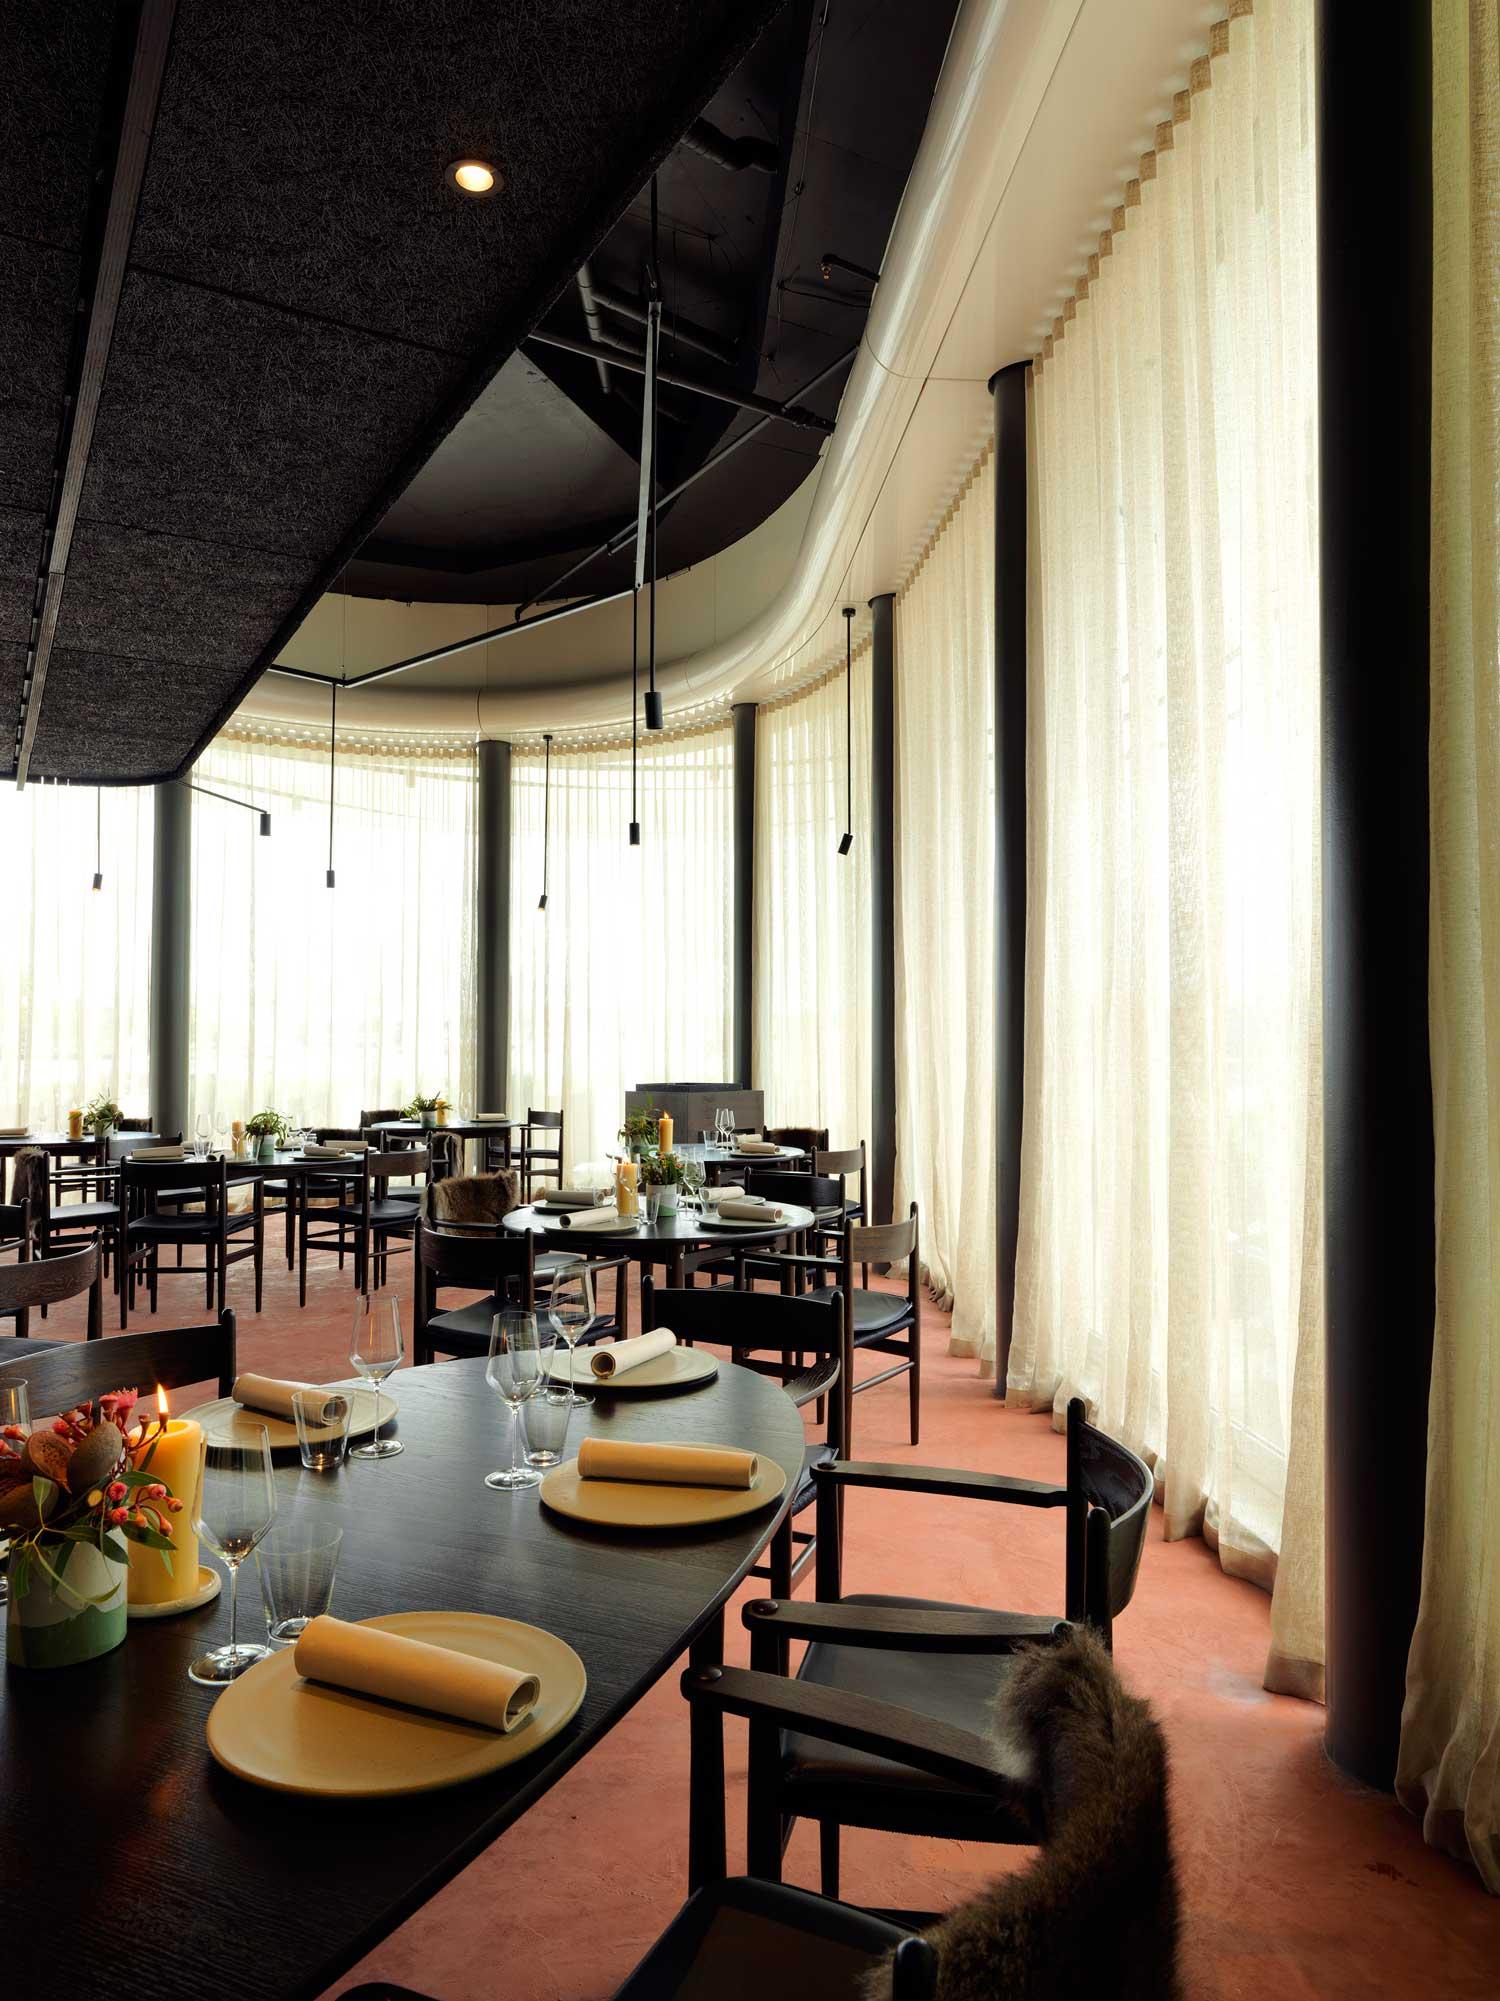 Noma Restaurant Pop-Up at Barangaroo Sydney by Foolscap Studio | Yellowtrace